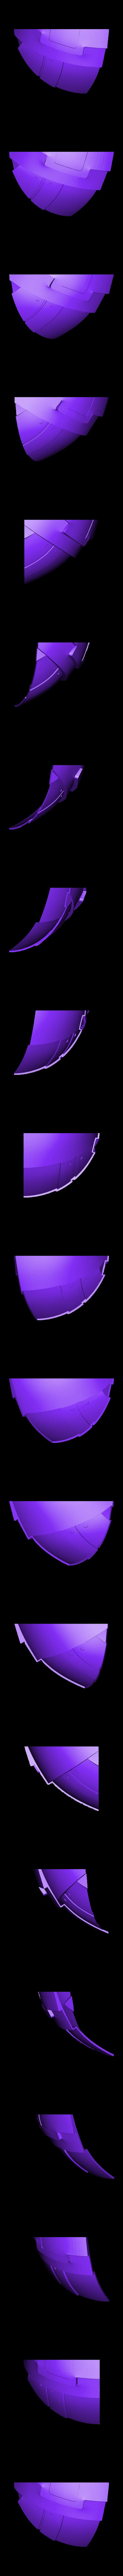 Part_19.stl Download free STL file Mass Effect N7 Breather Helmet • Template to 3D print, VillainousPropShop